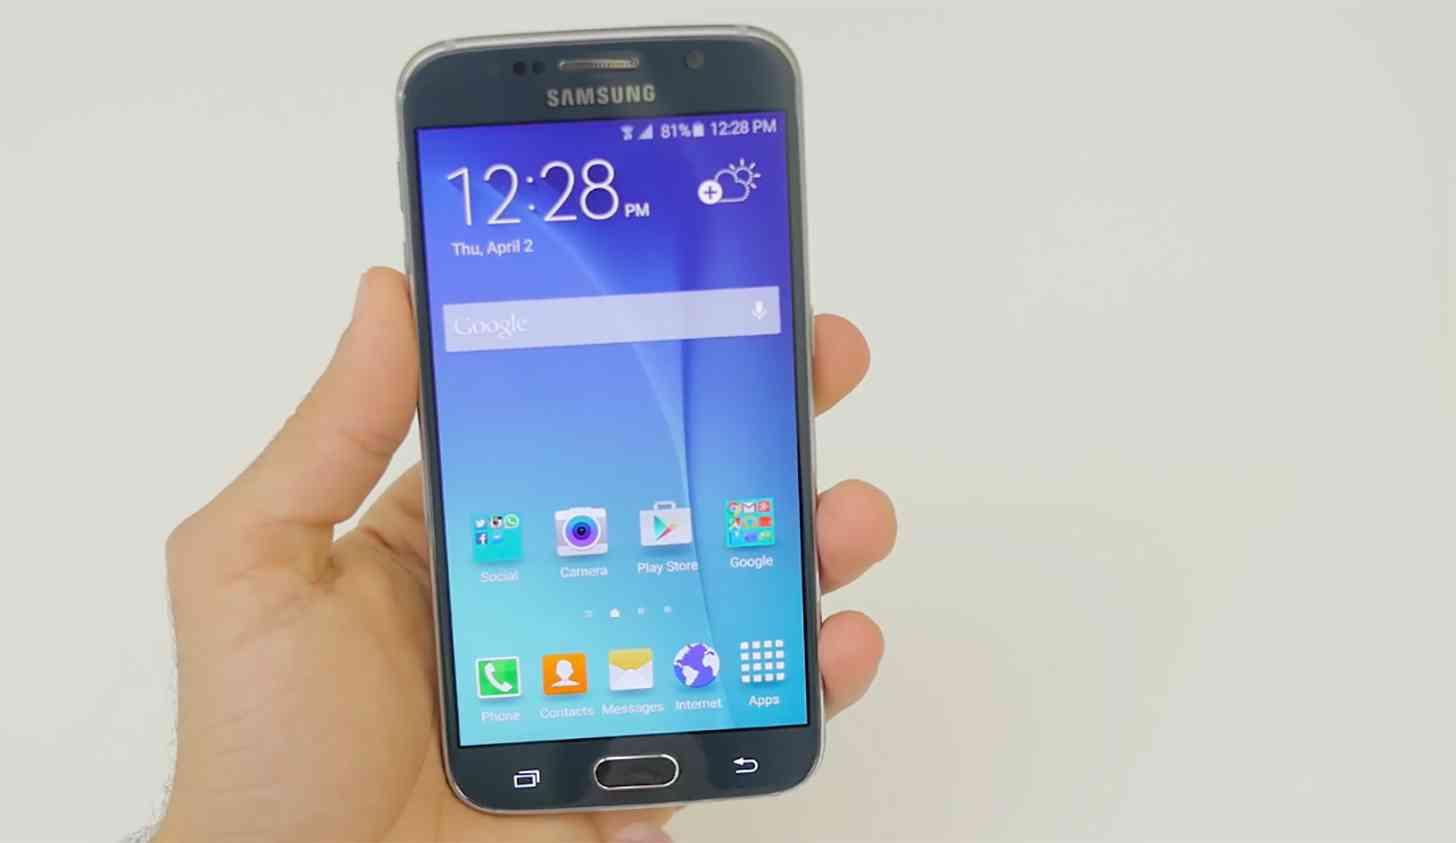 Samsung Galaxy S6 in hand